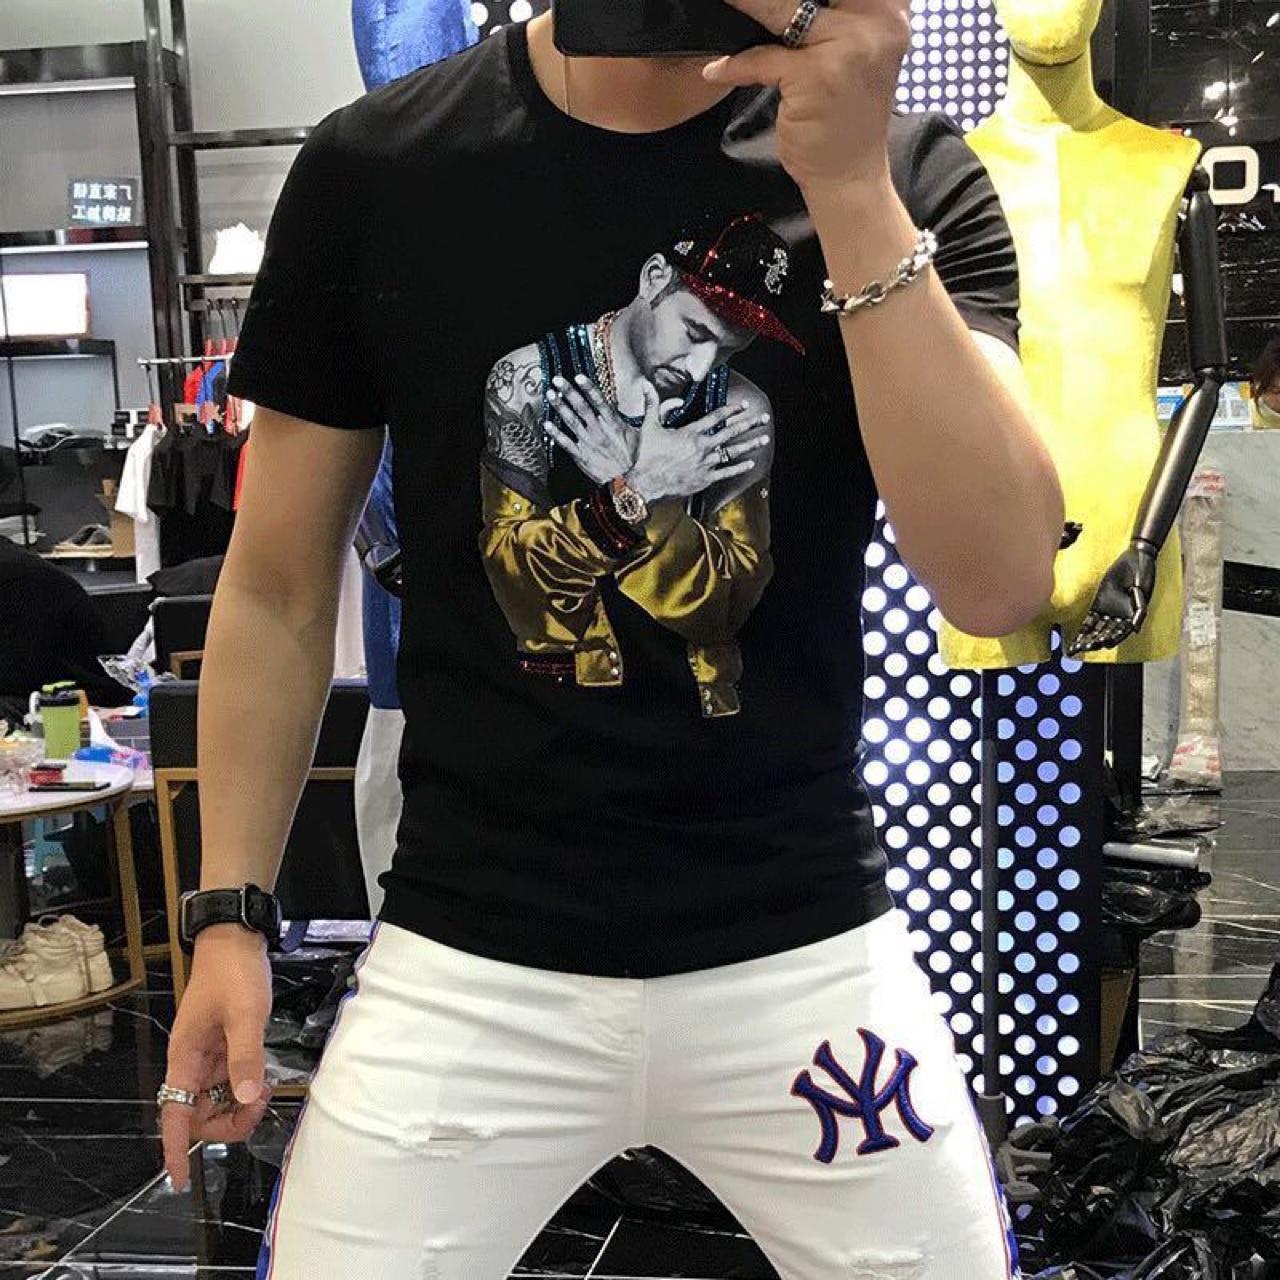 Mercerized Cotton Short-sleeved T-shirt Men's Summer Self-cultivation European Tide Brand Round Neck Printing Comfort